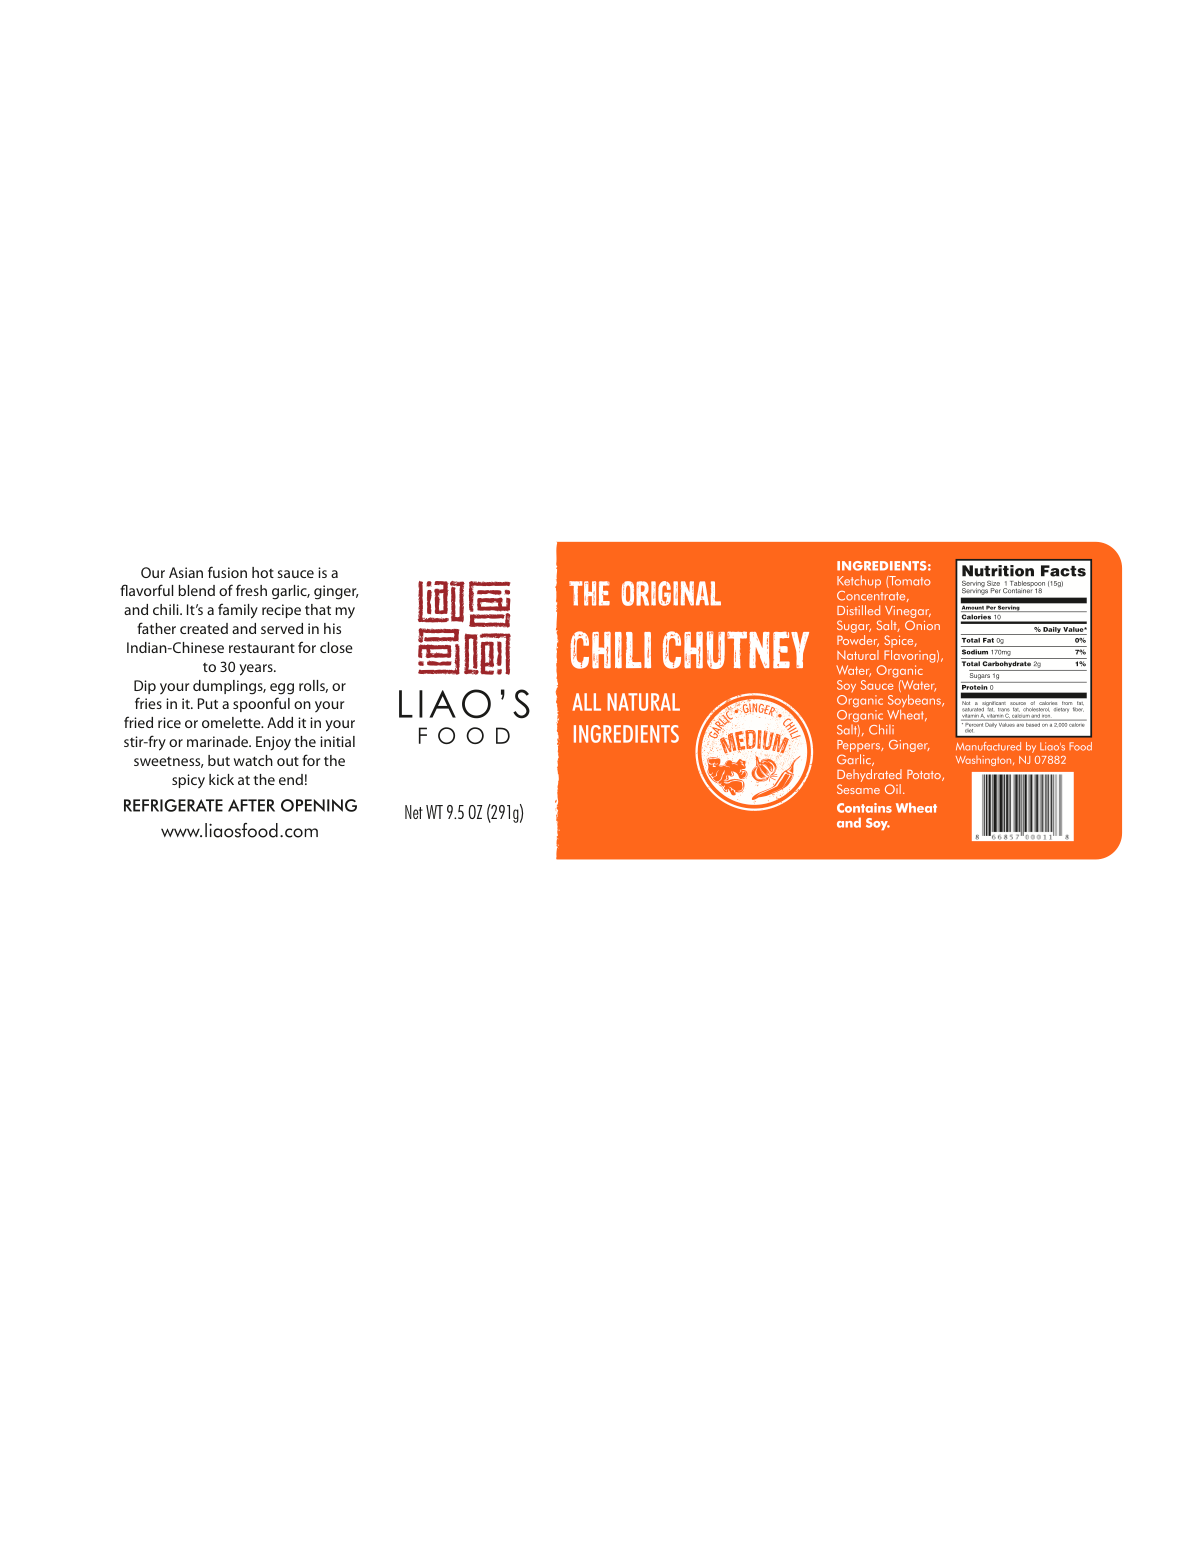 Chili Chutney Label Update